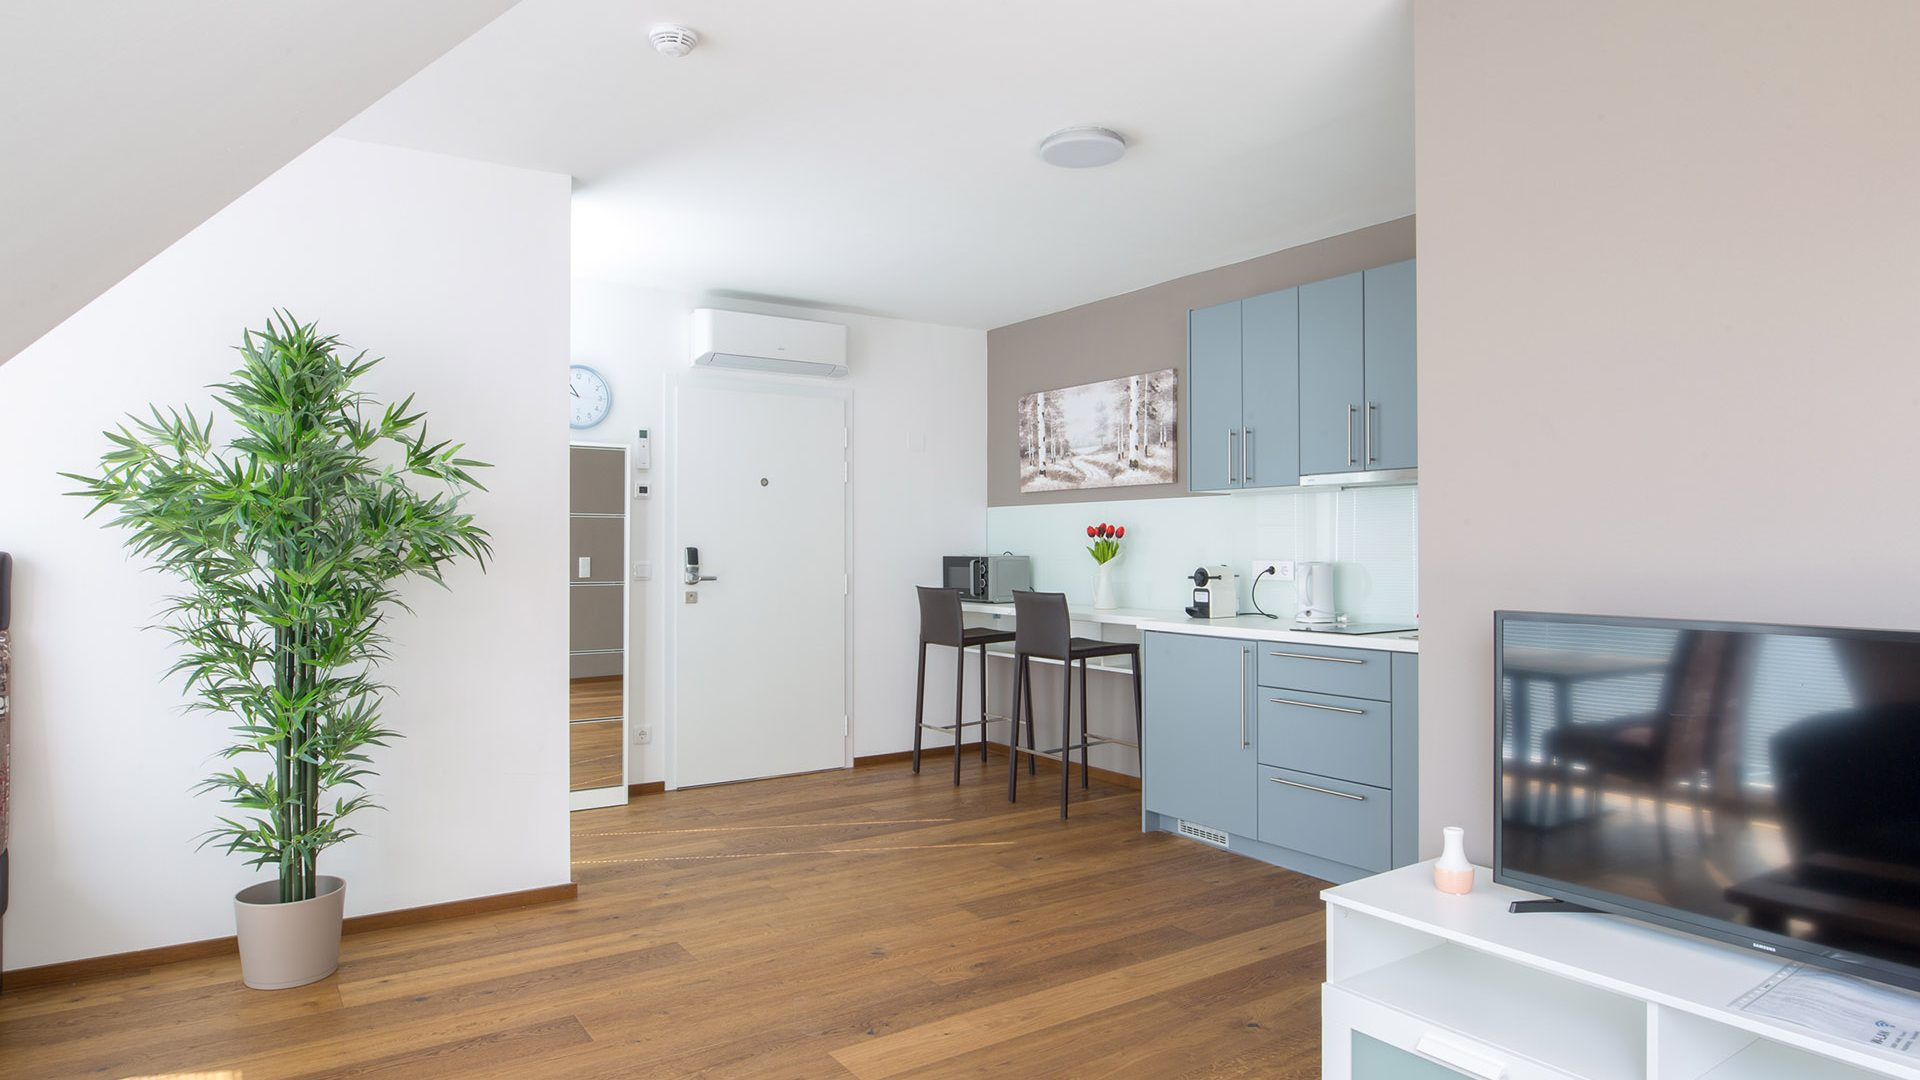 Ferienappartement Wien - waehringer guertel 4 top 22 apartments vienna flarent 1